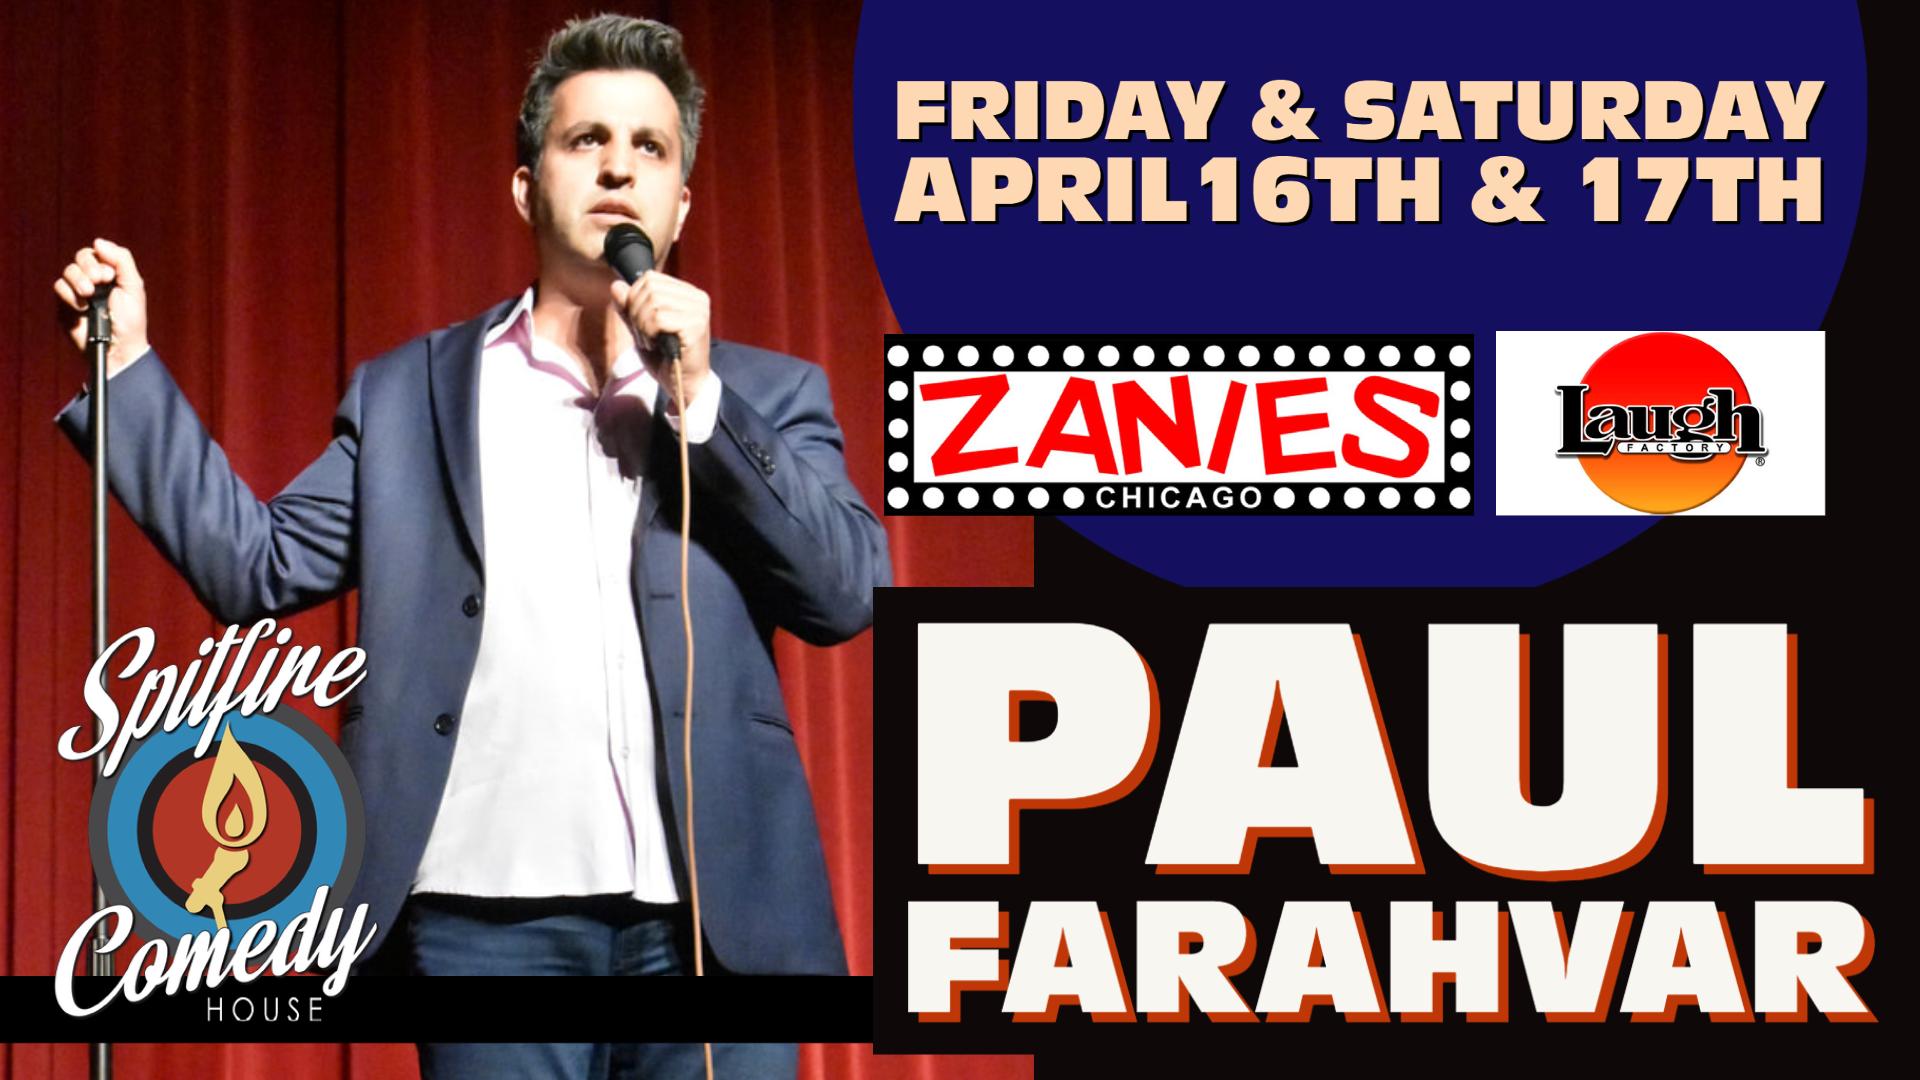 Paul Farahvar